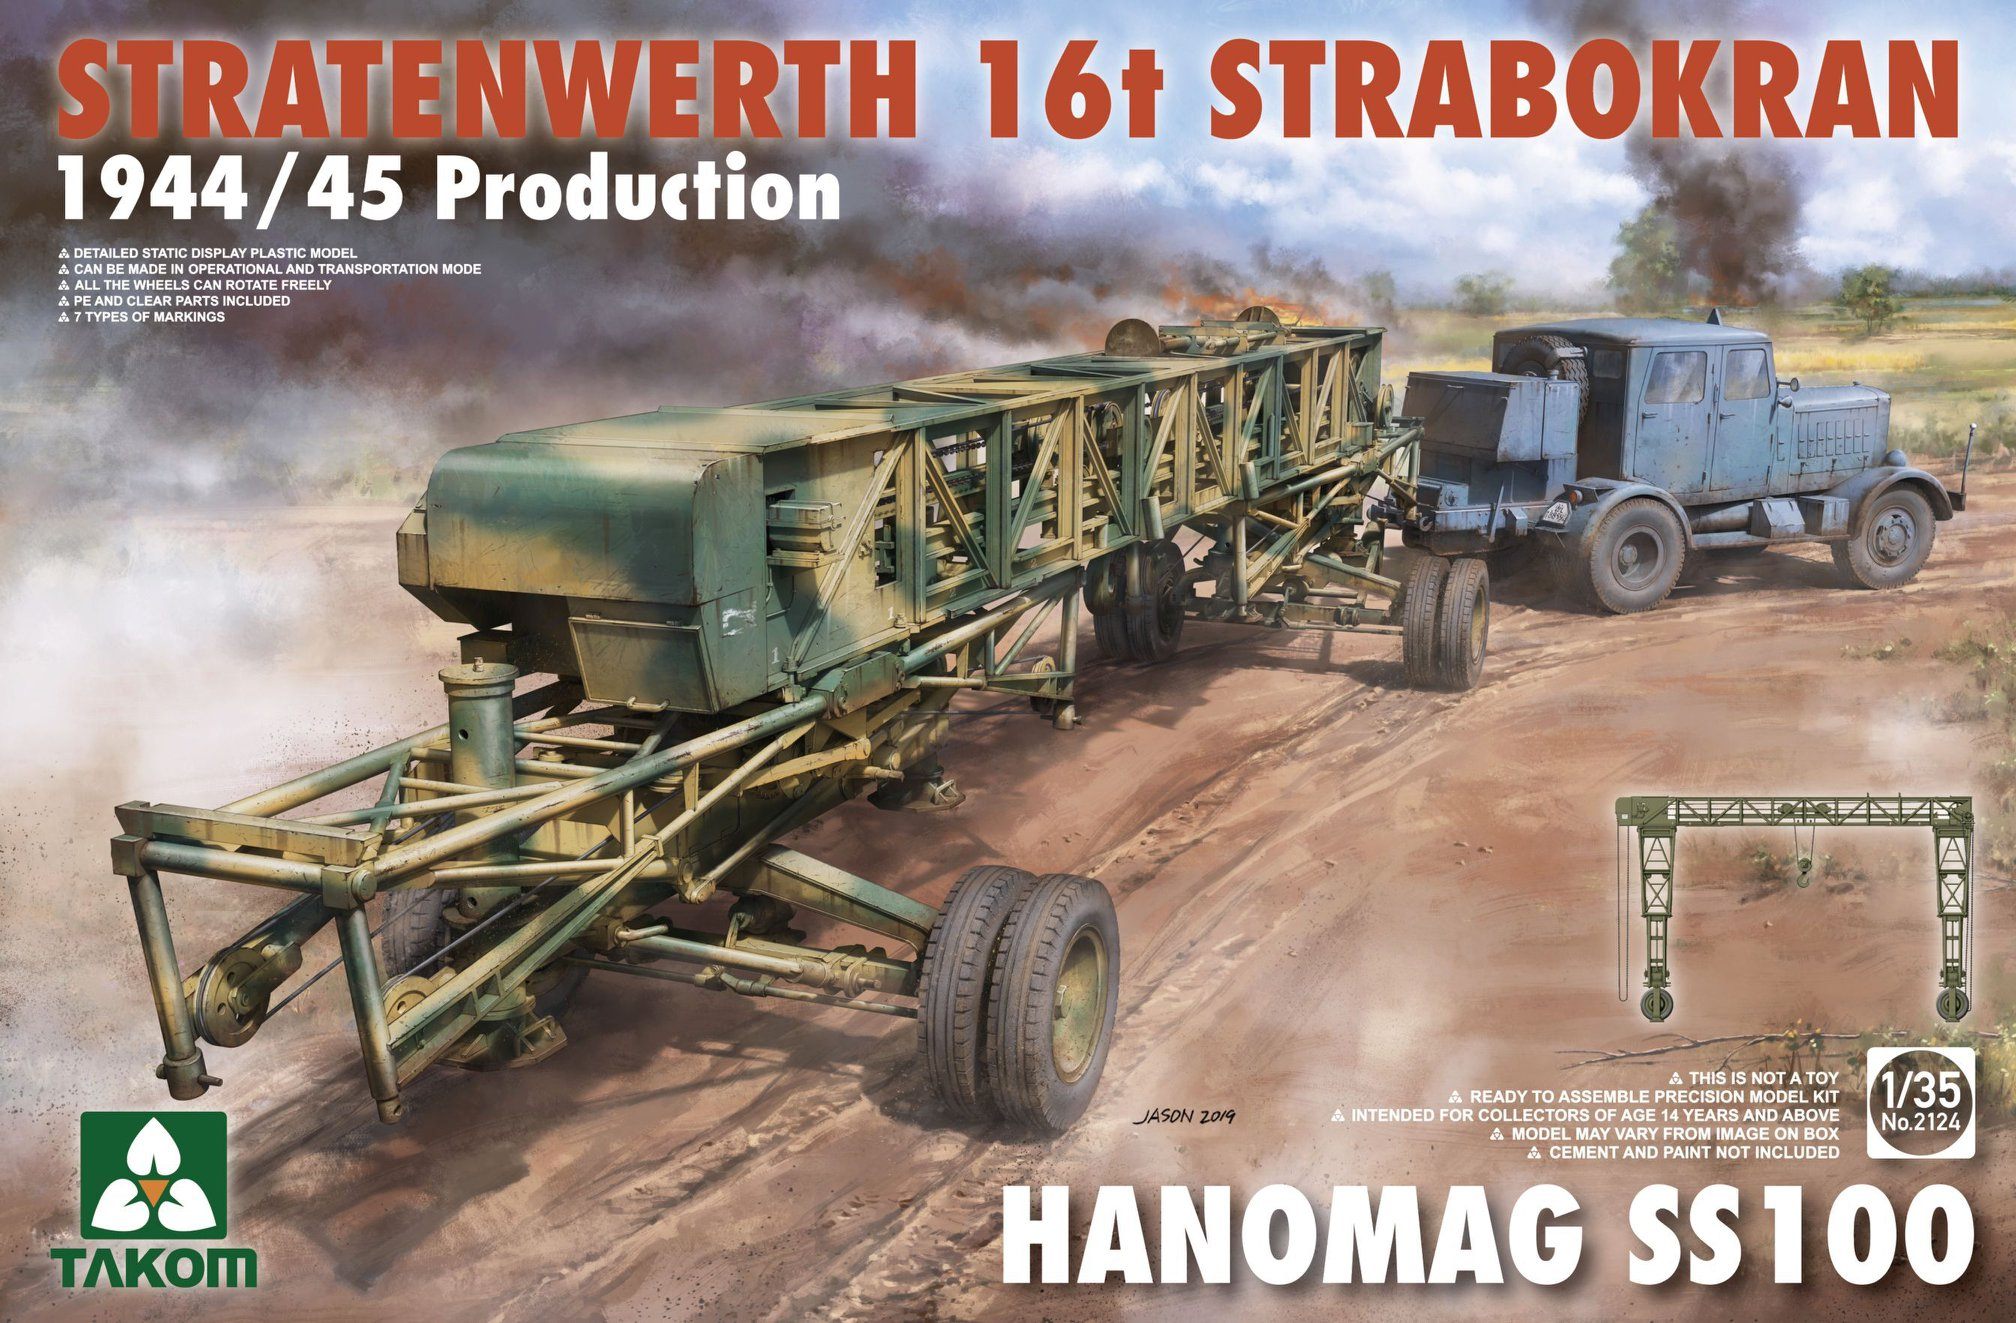 53279060_929811120560771_2183466557588373504_o Fries Kran 16t Strabokran 1943/1944 Production 1:35 Takom (#2109)